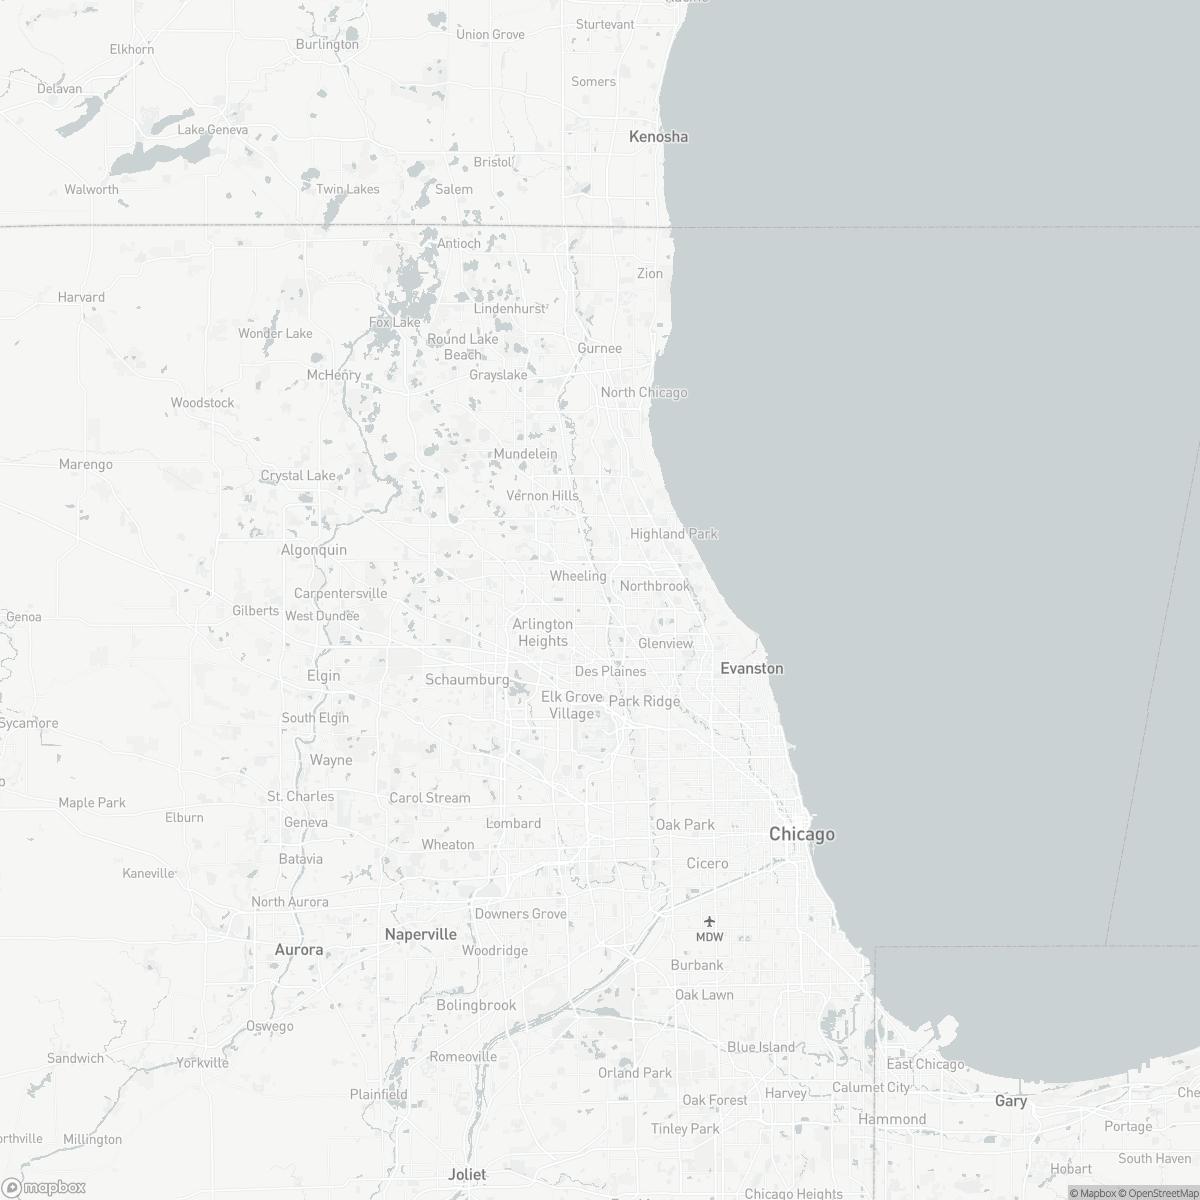 Map of Chicago Executive Airport PWK surrounding area of Wheeling Illinois